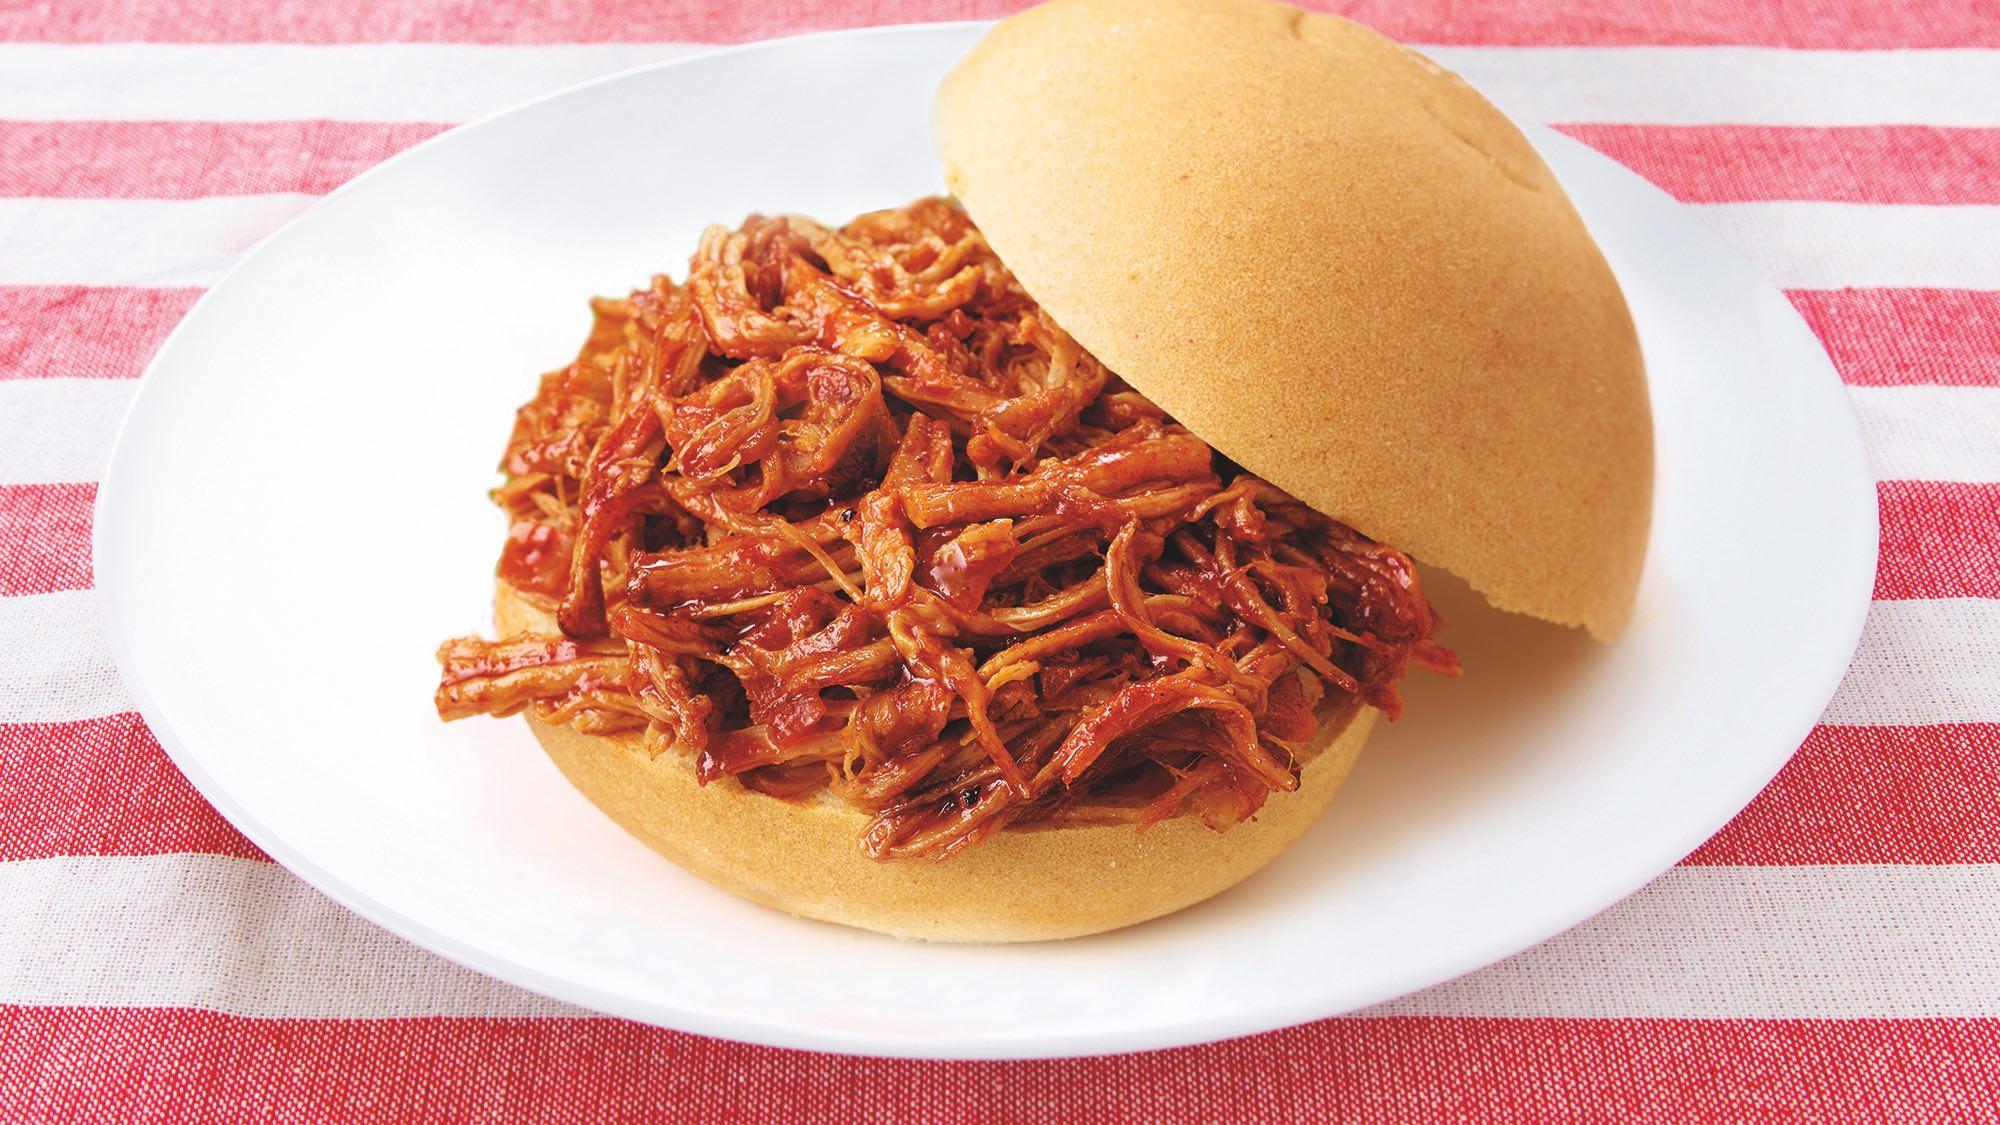 slow-cooker-smoky-bourbon-bbq-pulled-pork.jpg